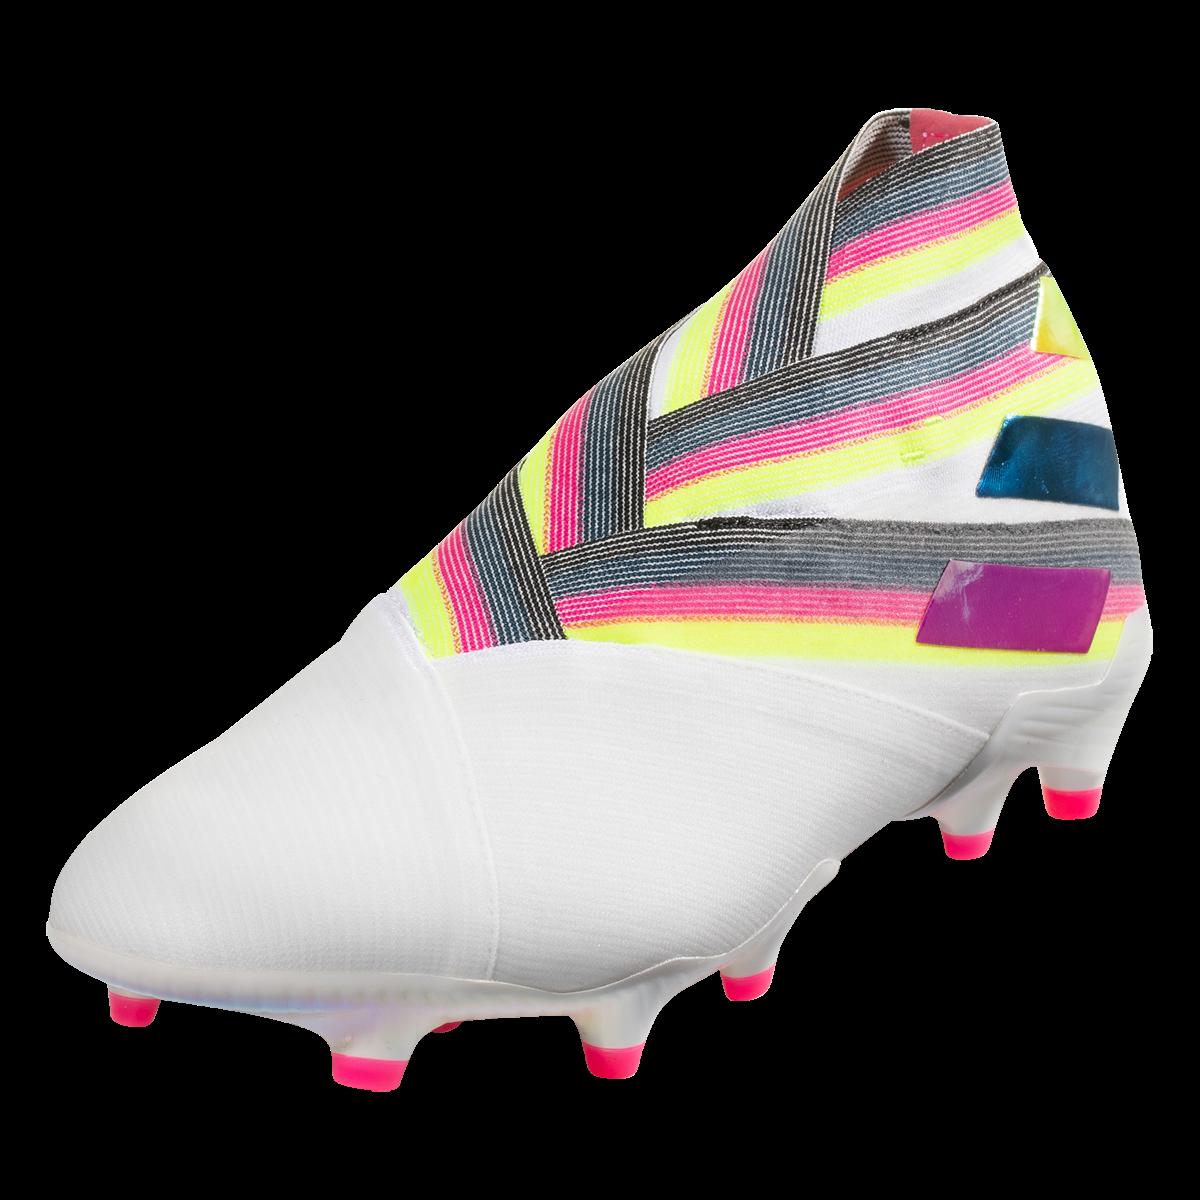 adidas Nemeziz 19+ FG ADV Soccer Cleat WhitePinkYellow